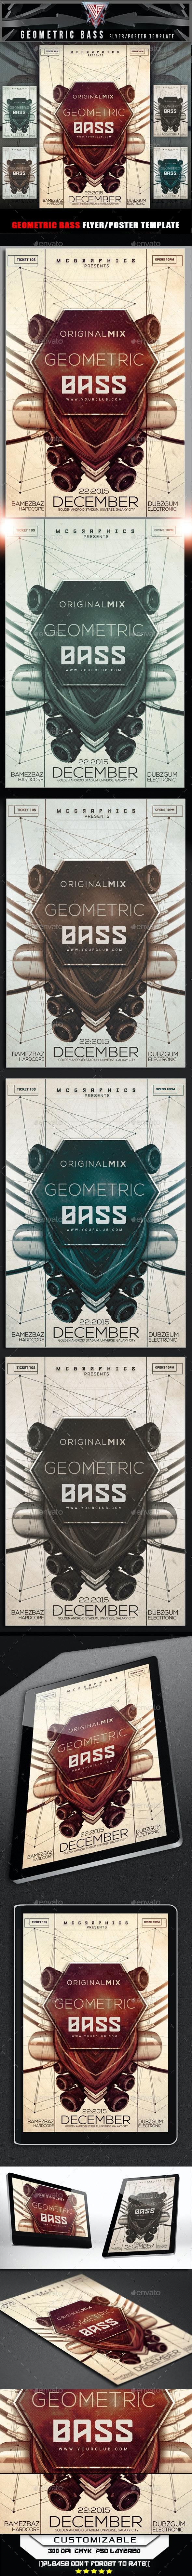 Geometric Bass Flyer Template - Flyers Print Templates